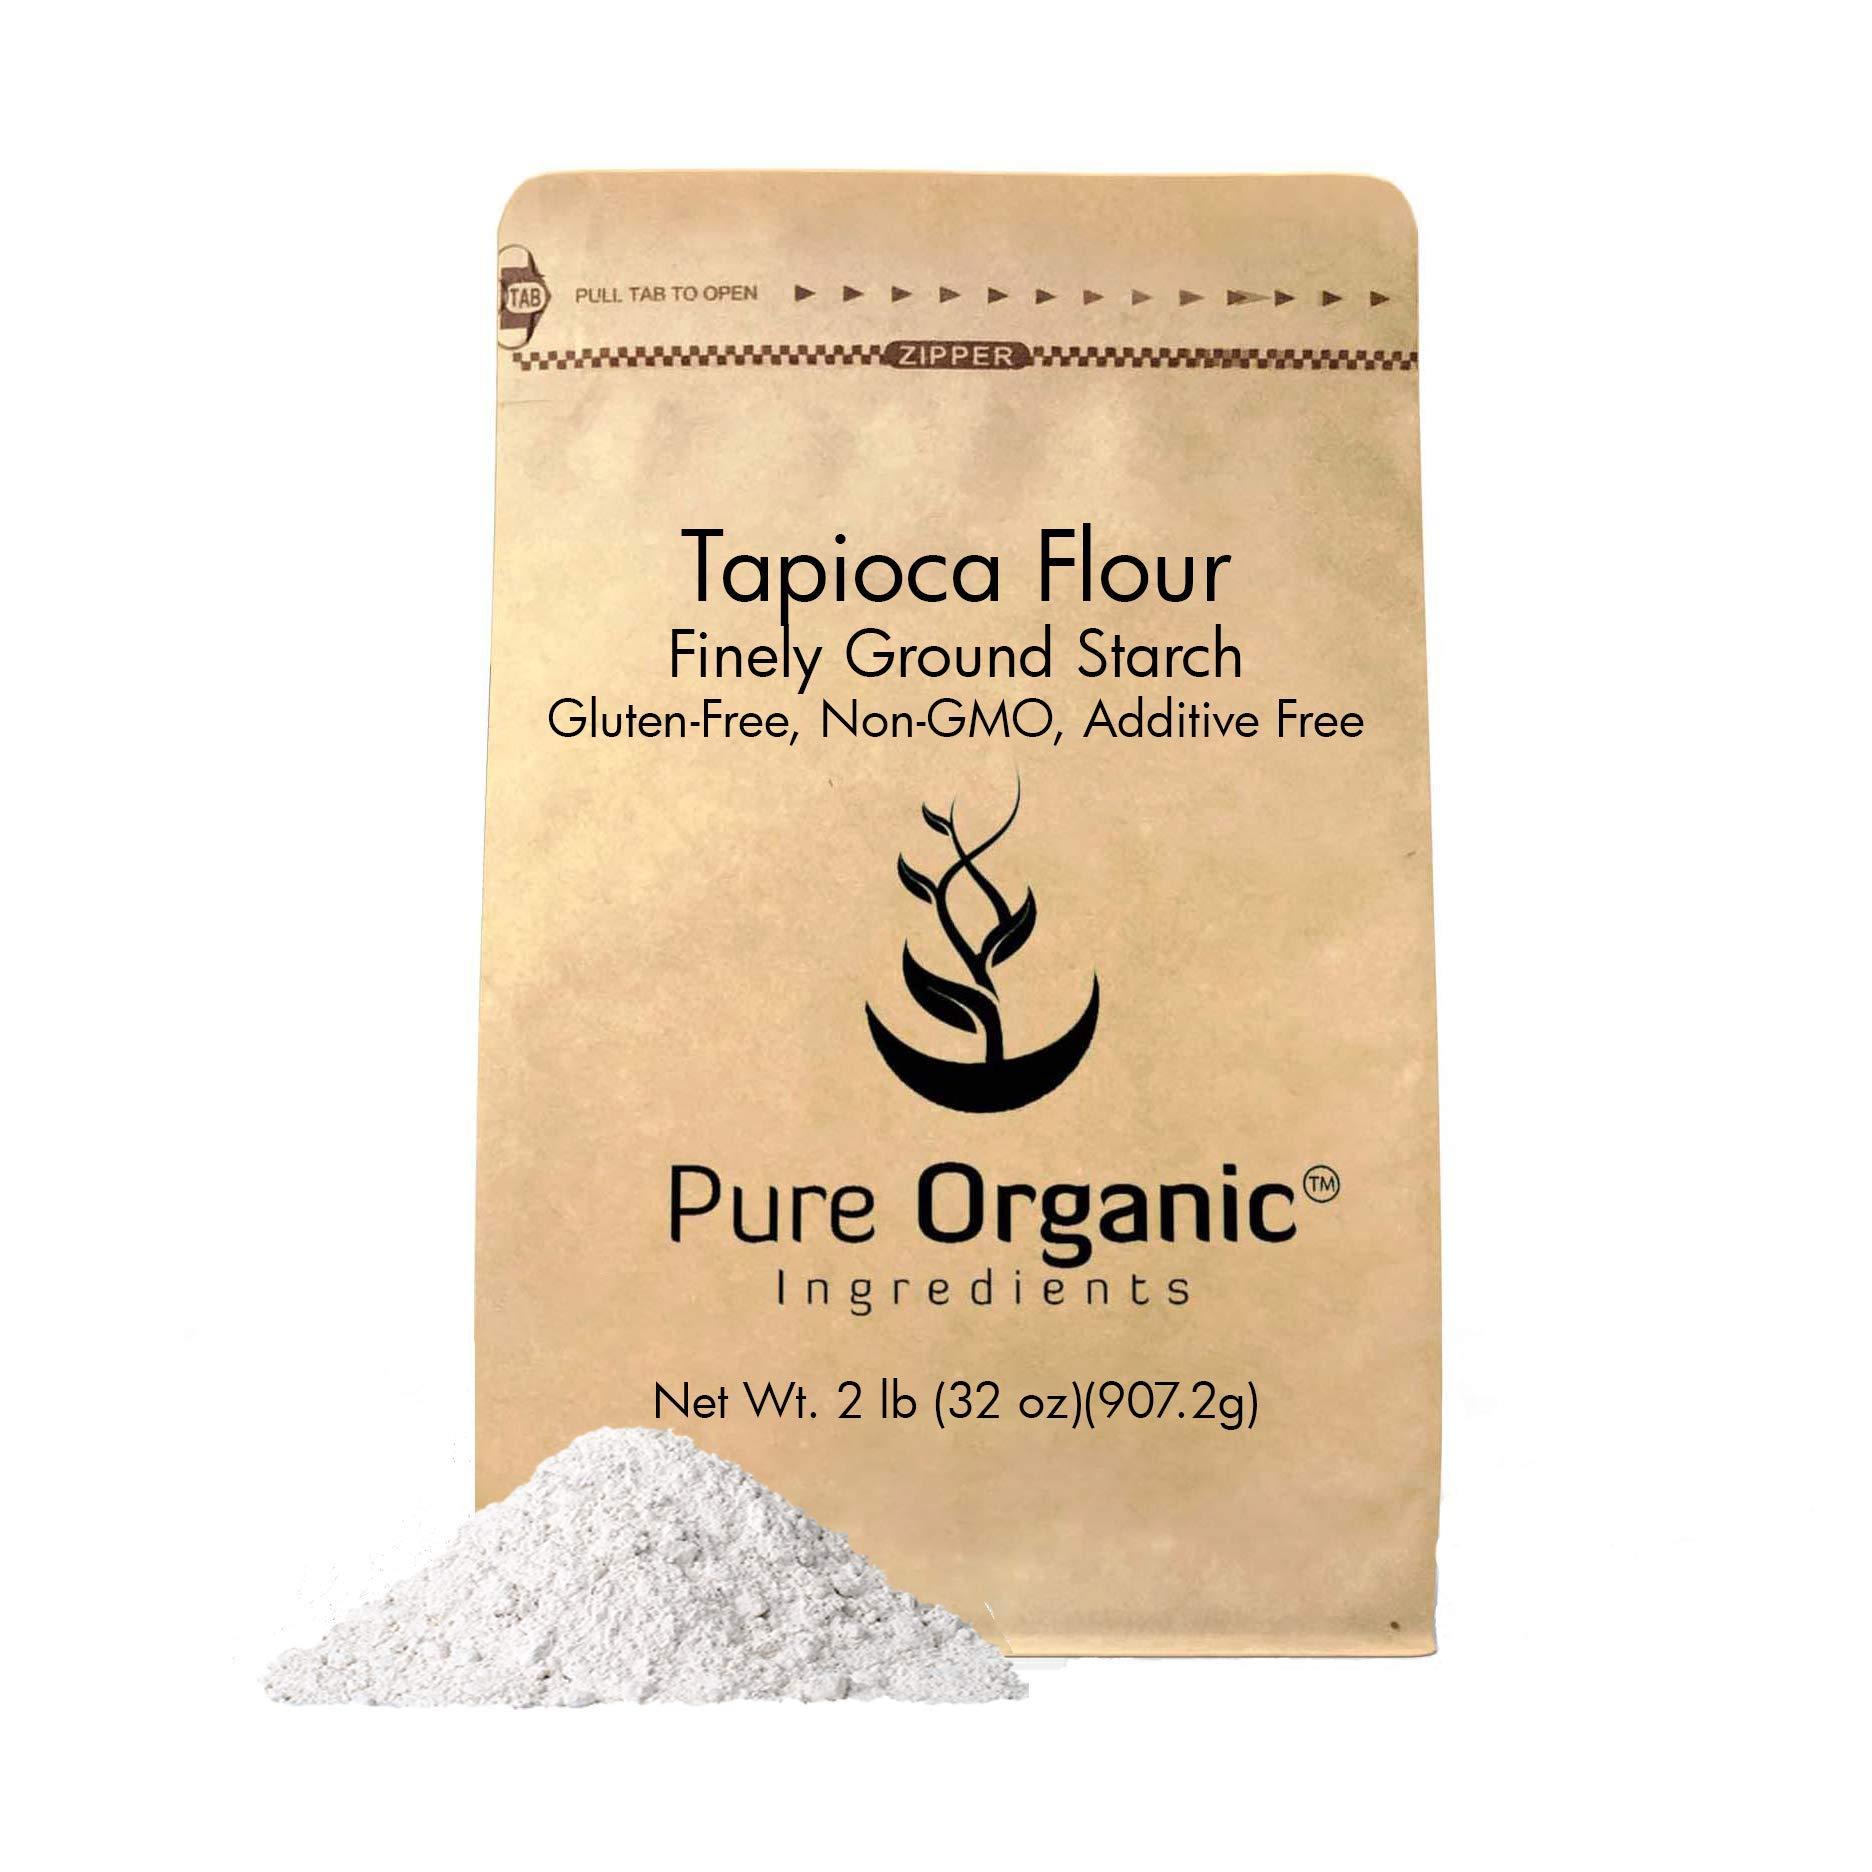 Pure Organic Ingredients Tapioca Flour, 2 lb. (32 oz.), Resealable Eco-Friendly Packaging, Also Called Tapioca Starch, Fine White Powder, Gluten-Free, Non-GMO